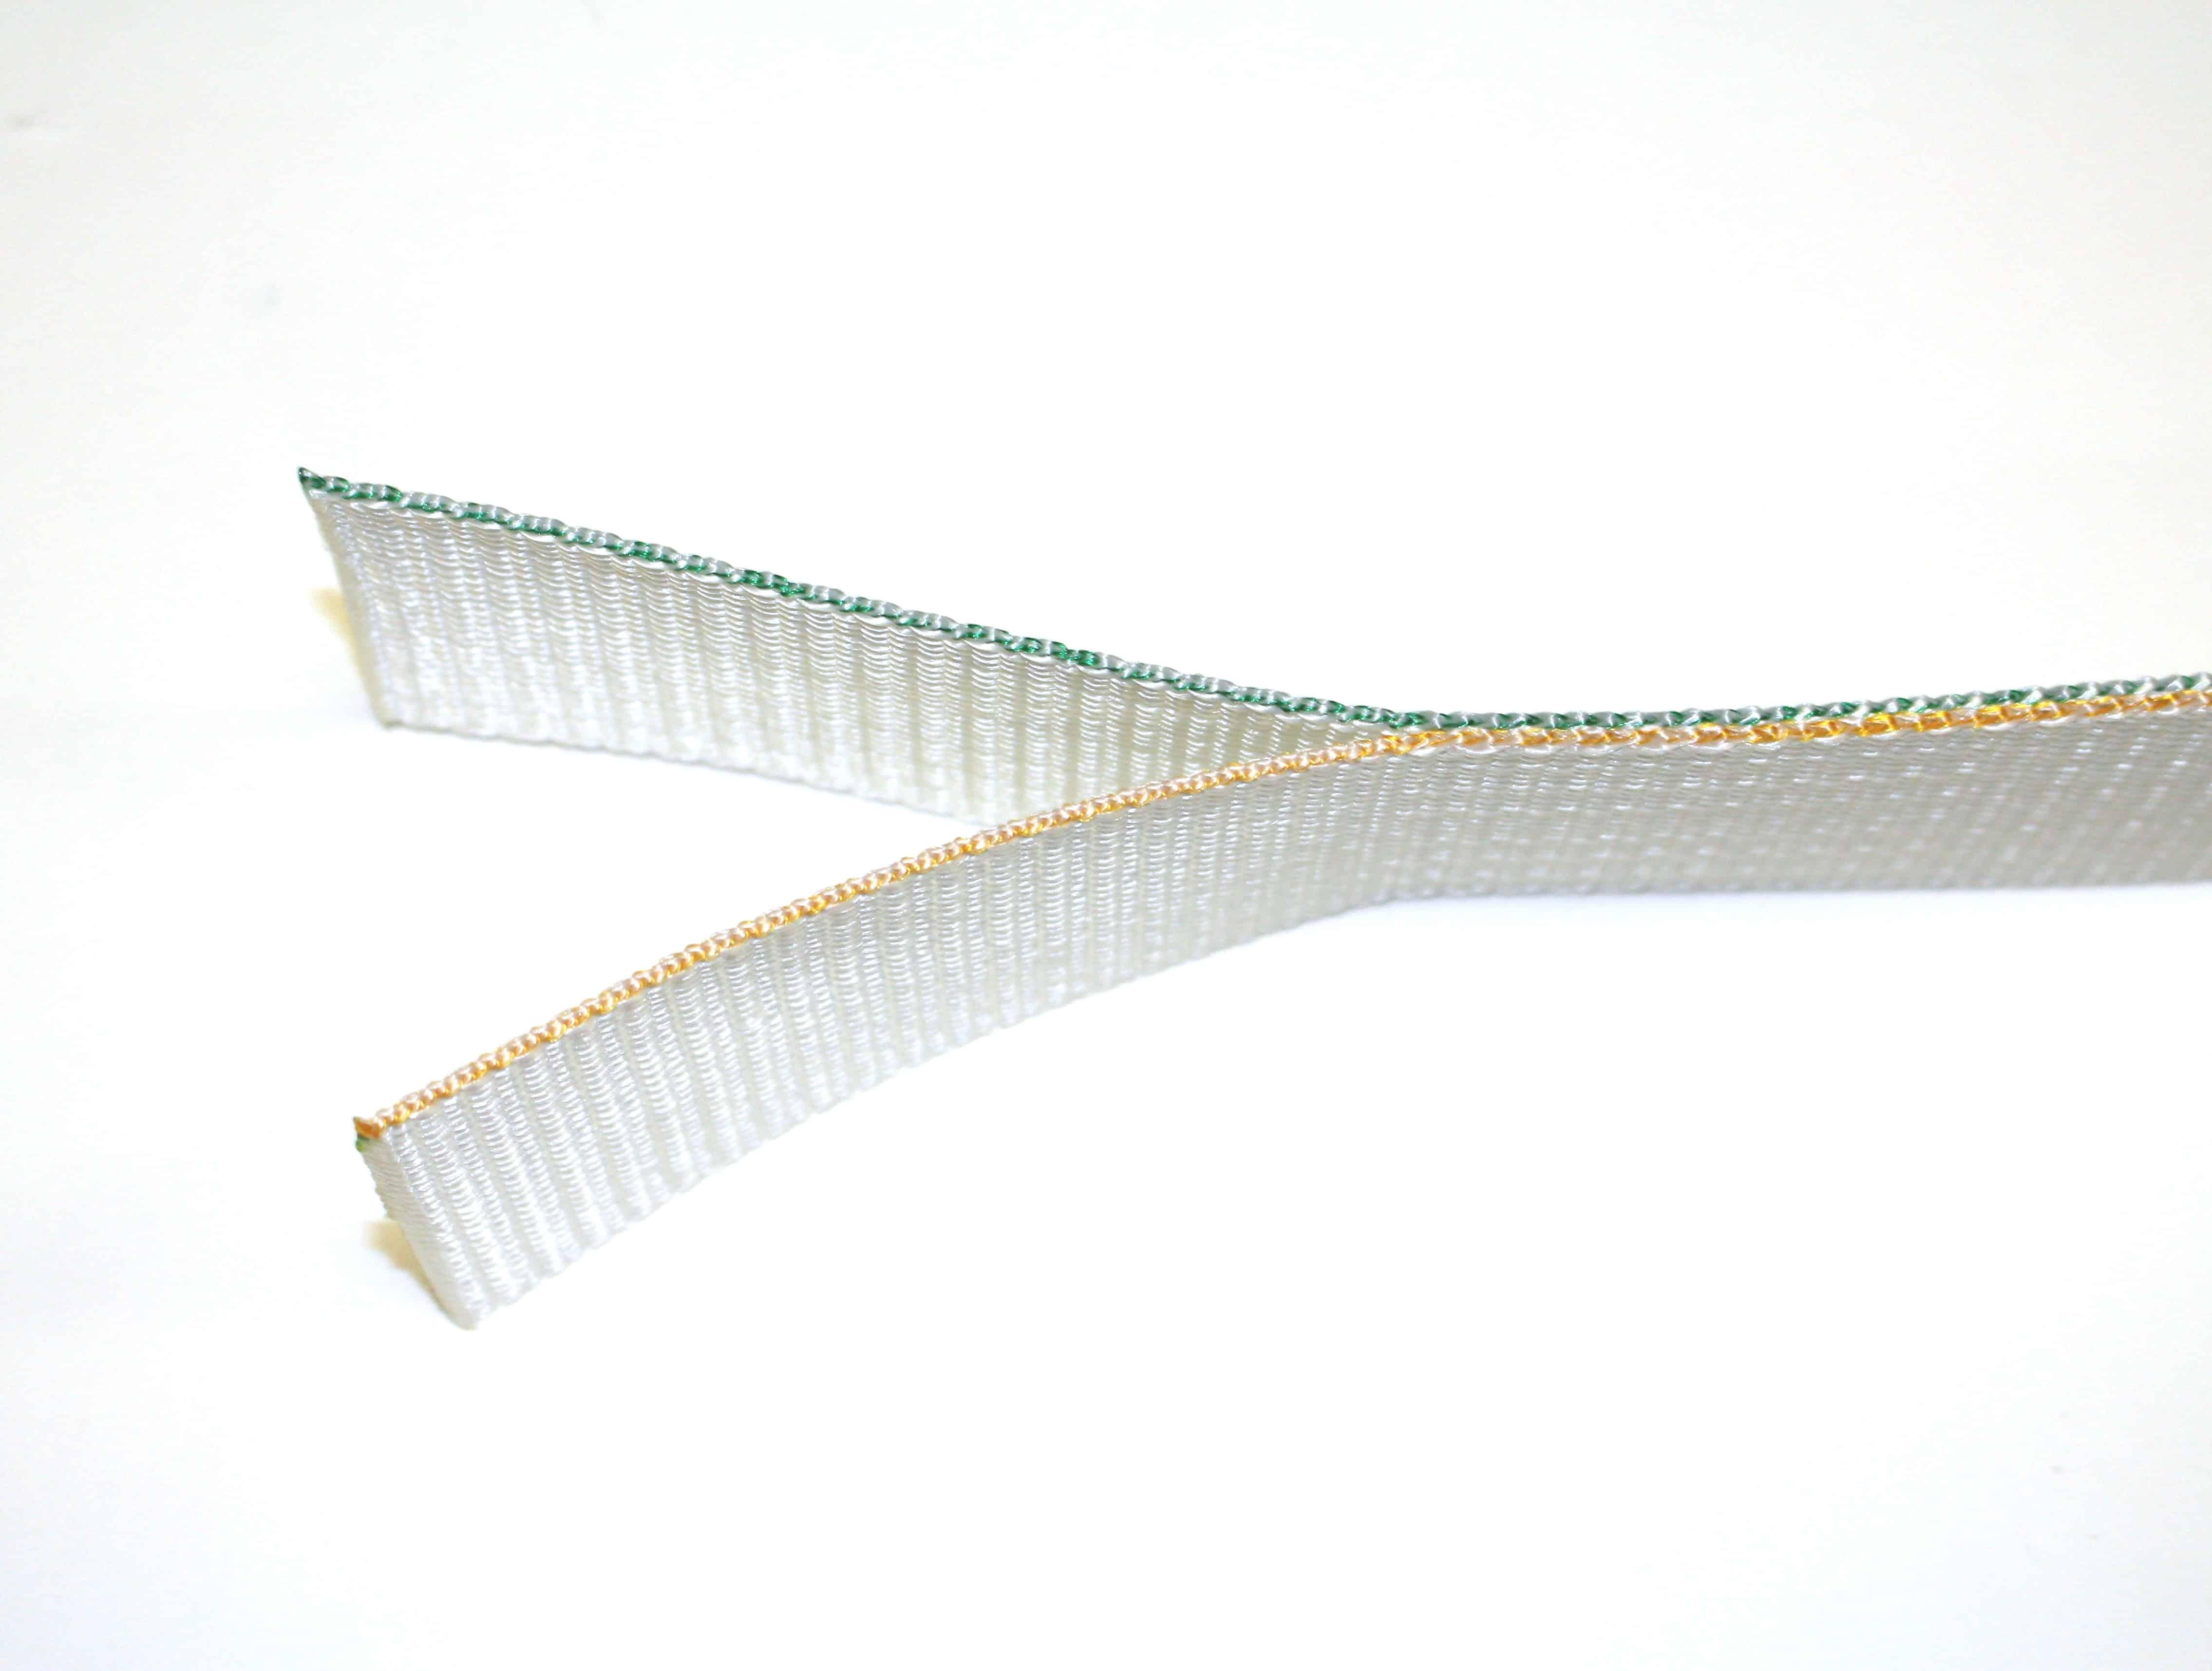 CSA Z259.11 Class E4 & E6; 1.95″ Single Wing Natural Polyester Tear Webbing w/ Cut Bar